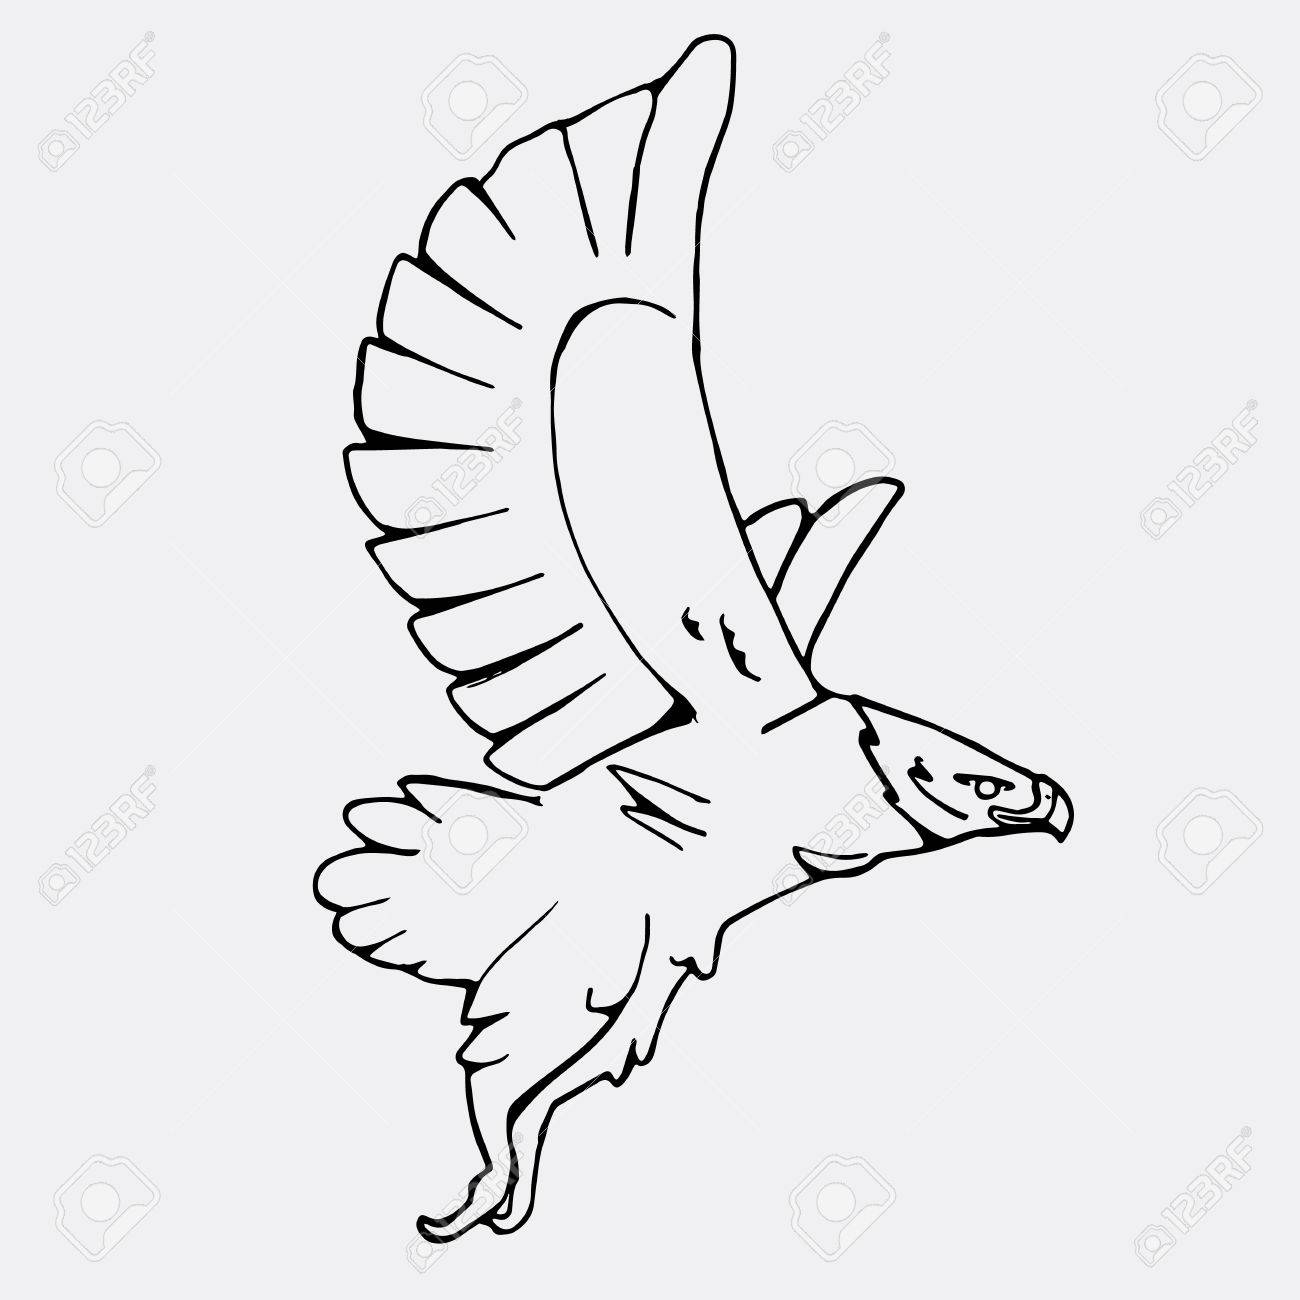 1300x1300 Hand Drawn Pencil Graphics, Vulture, Eagle, Osprey, Falcon, Hawk